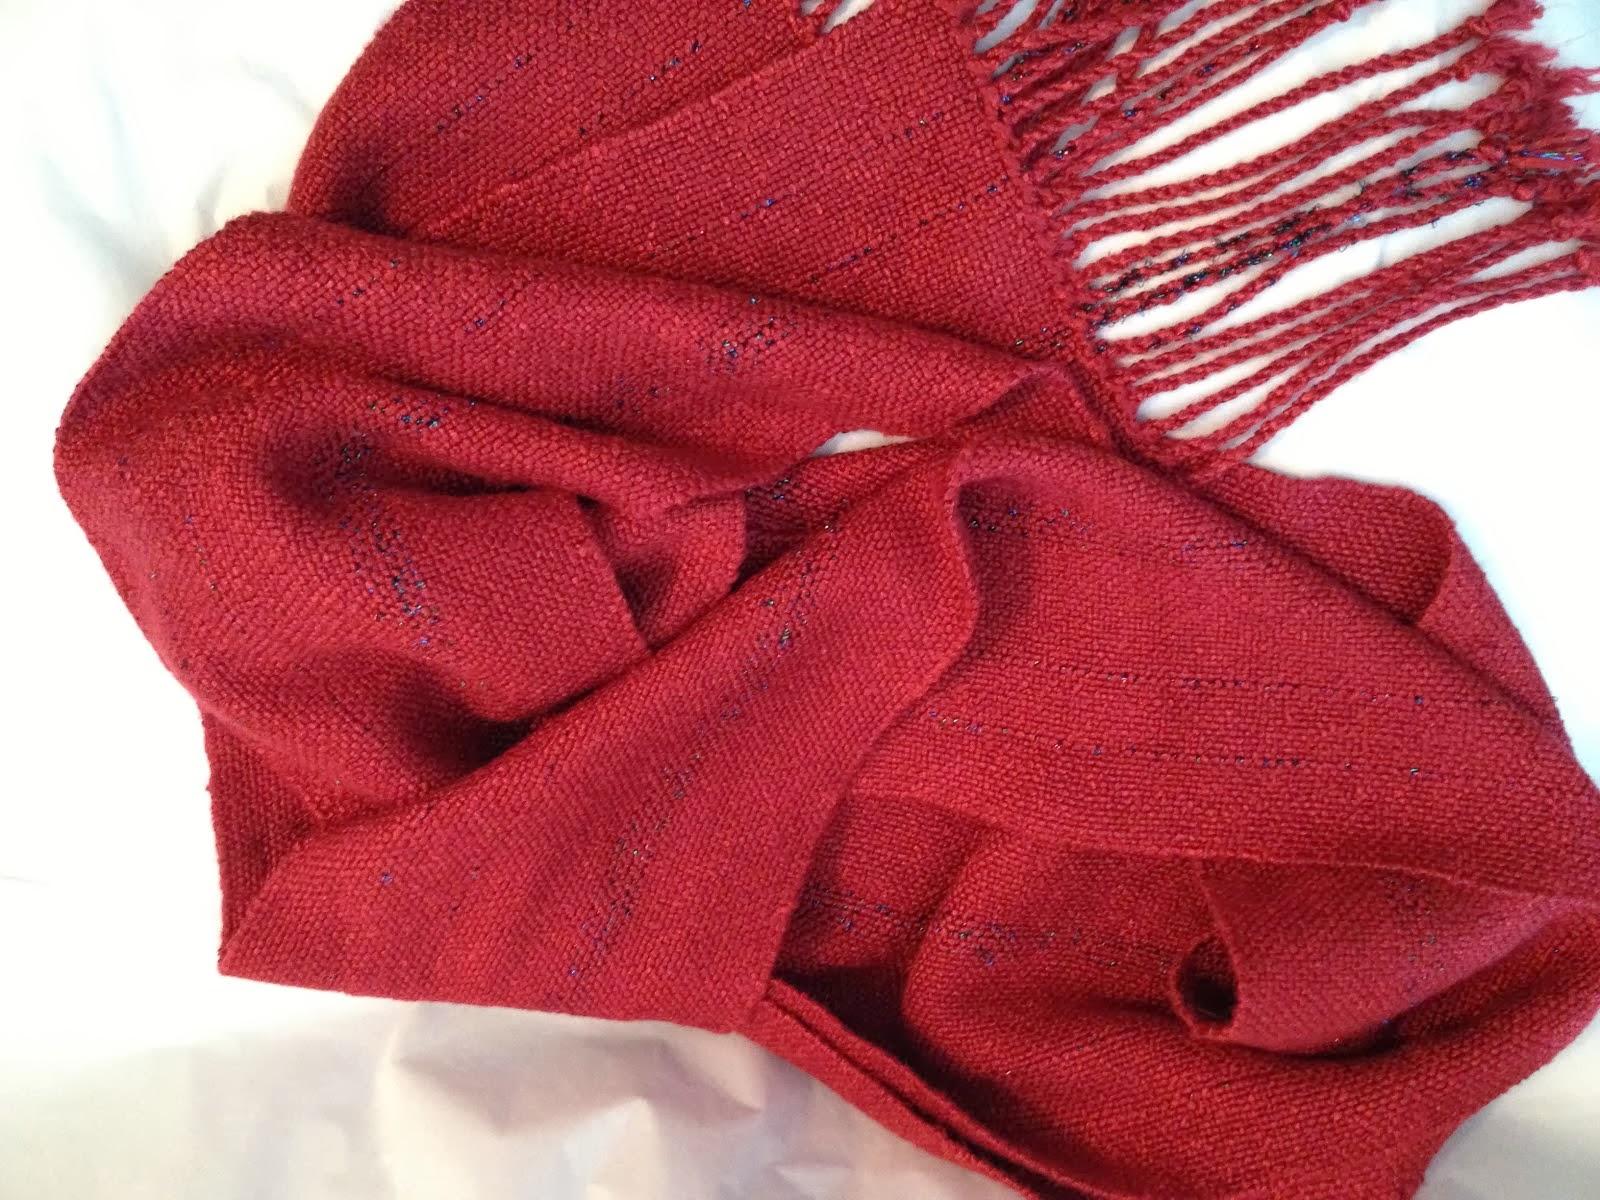 Kathy's Red Rayon RicRac Christmas Scarf